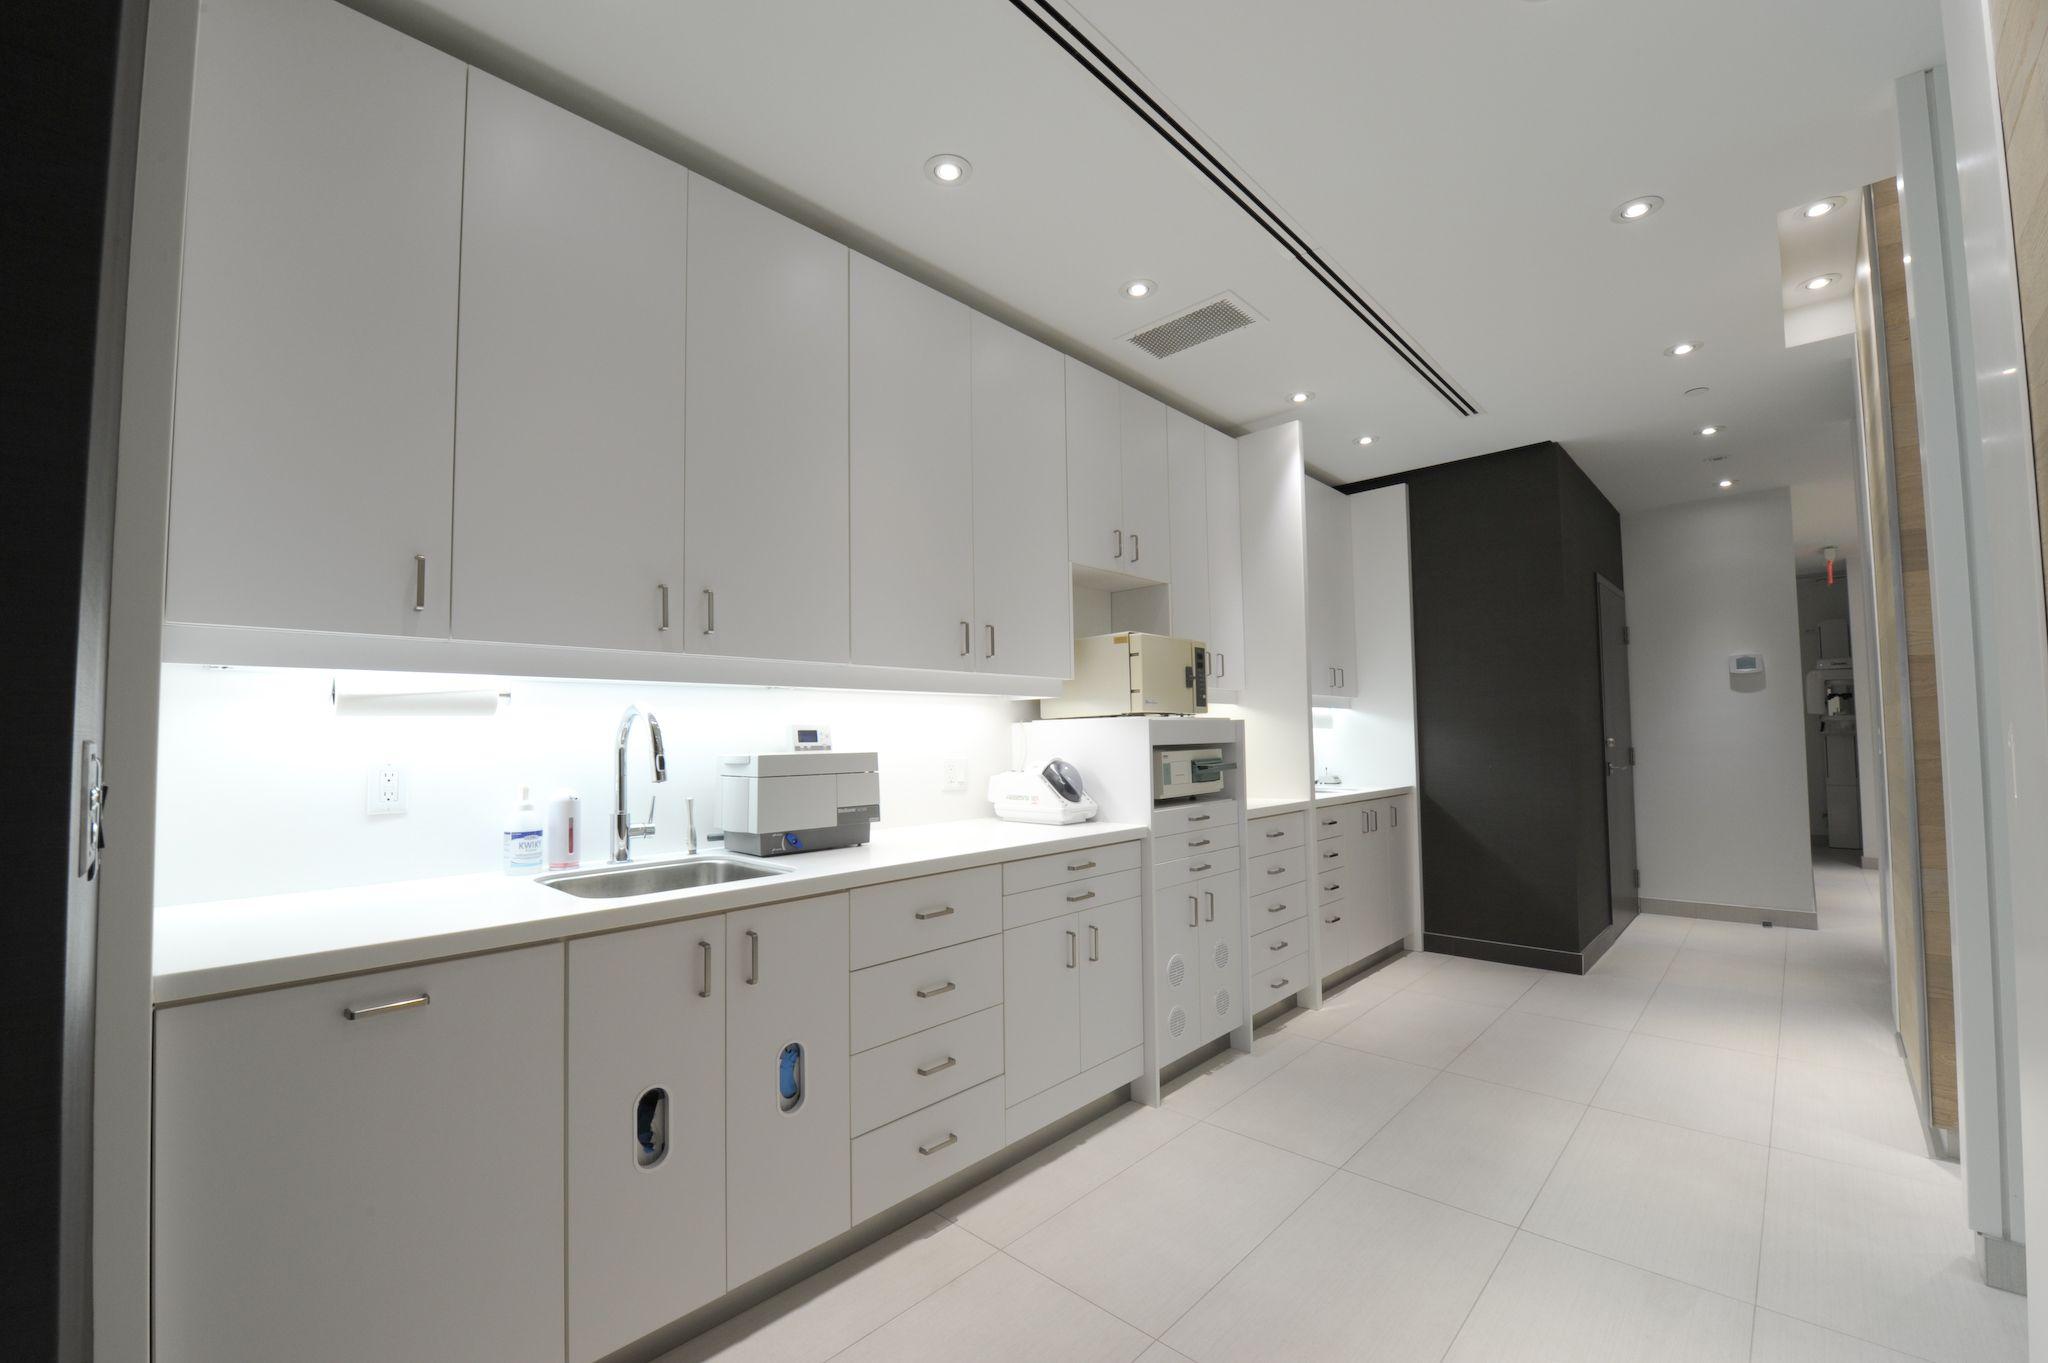 Sterilization area and lab